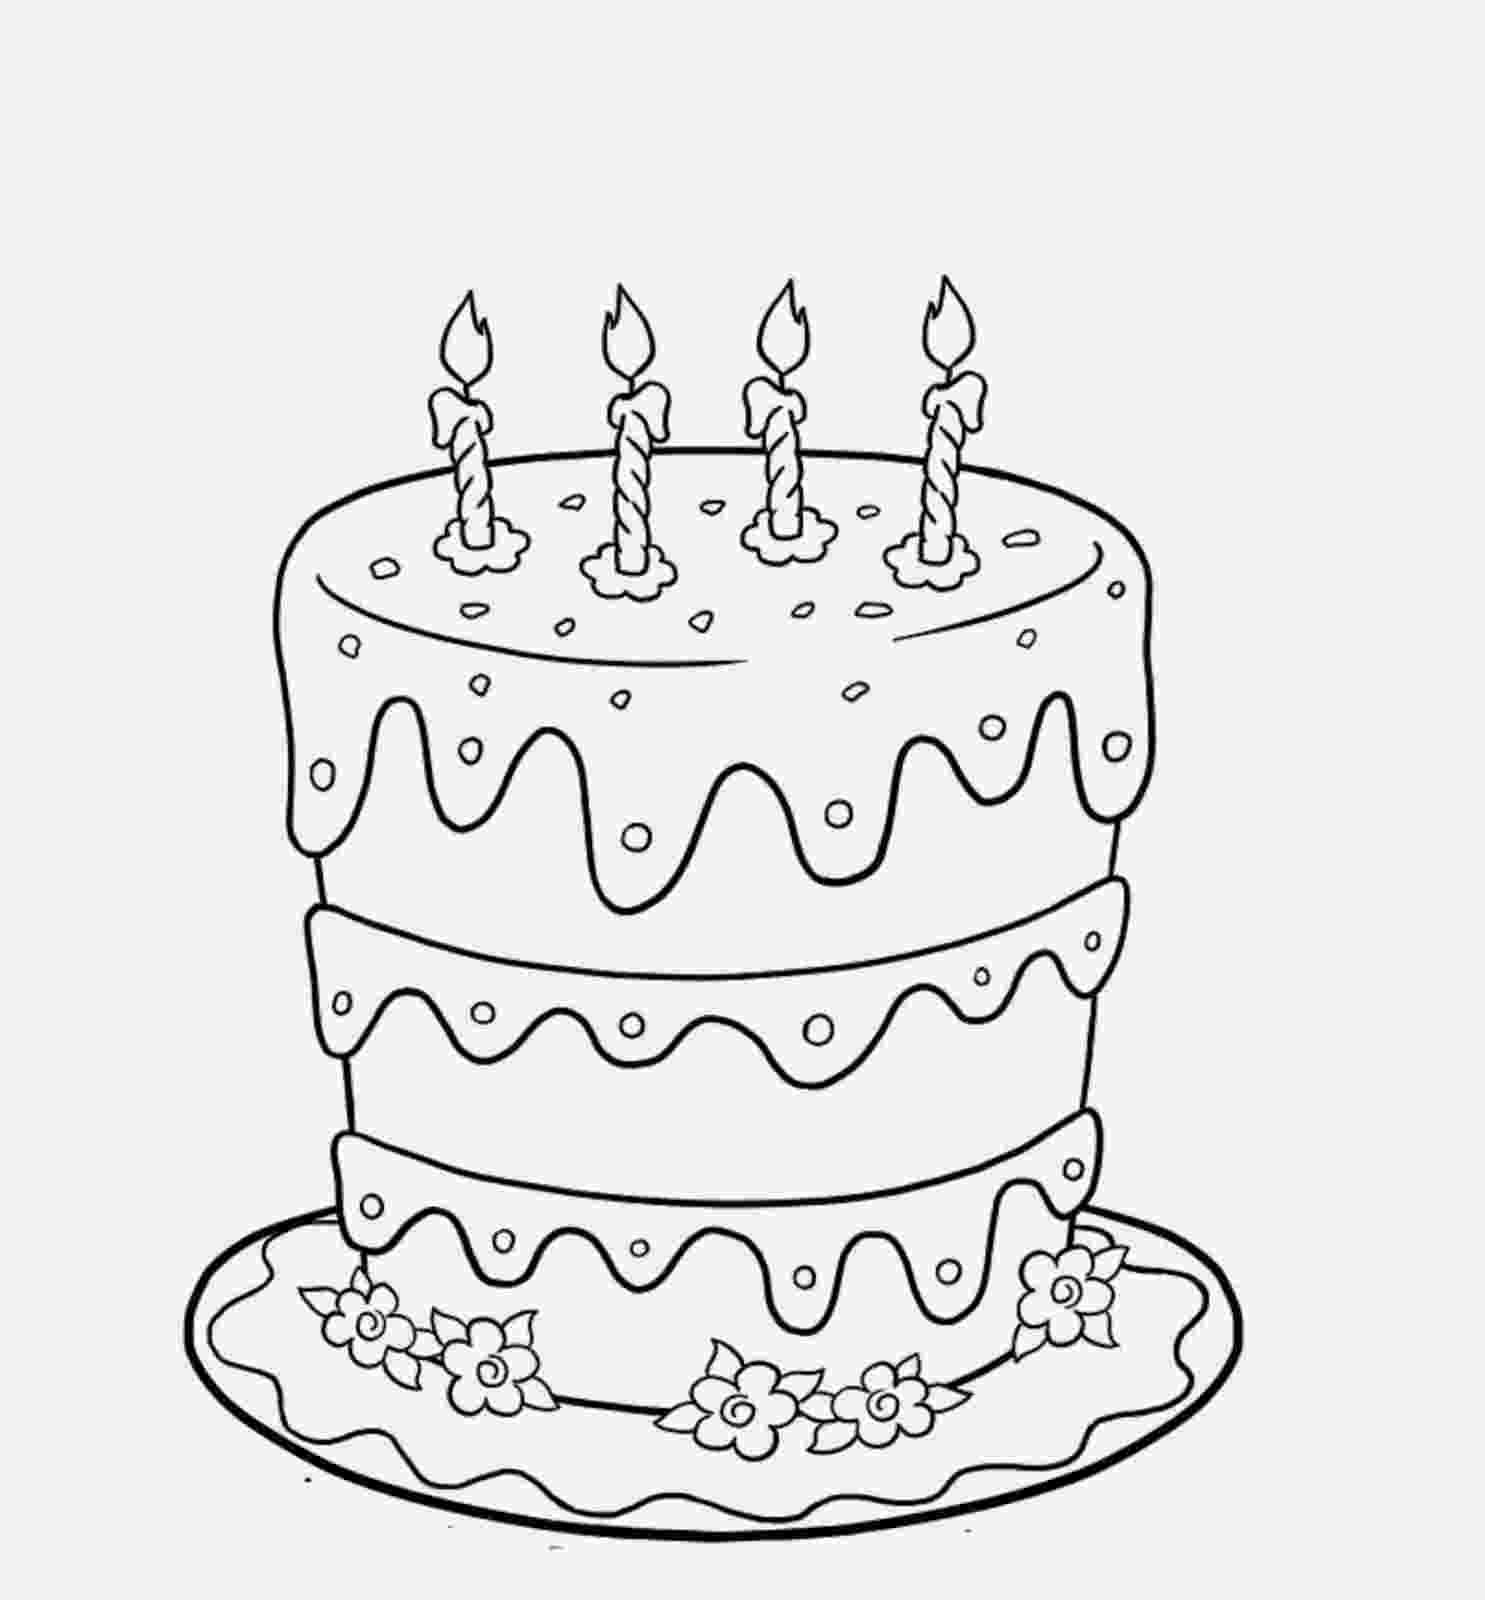 big birthday cake how to draw a birthday cake step by step drawing birthday cake big